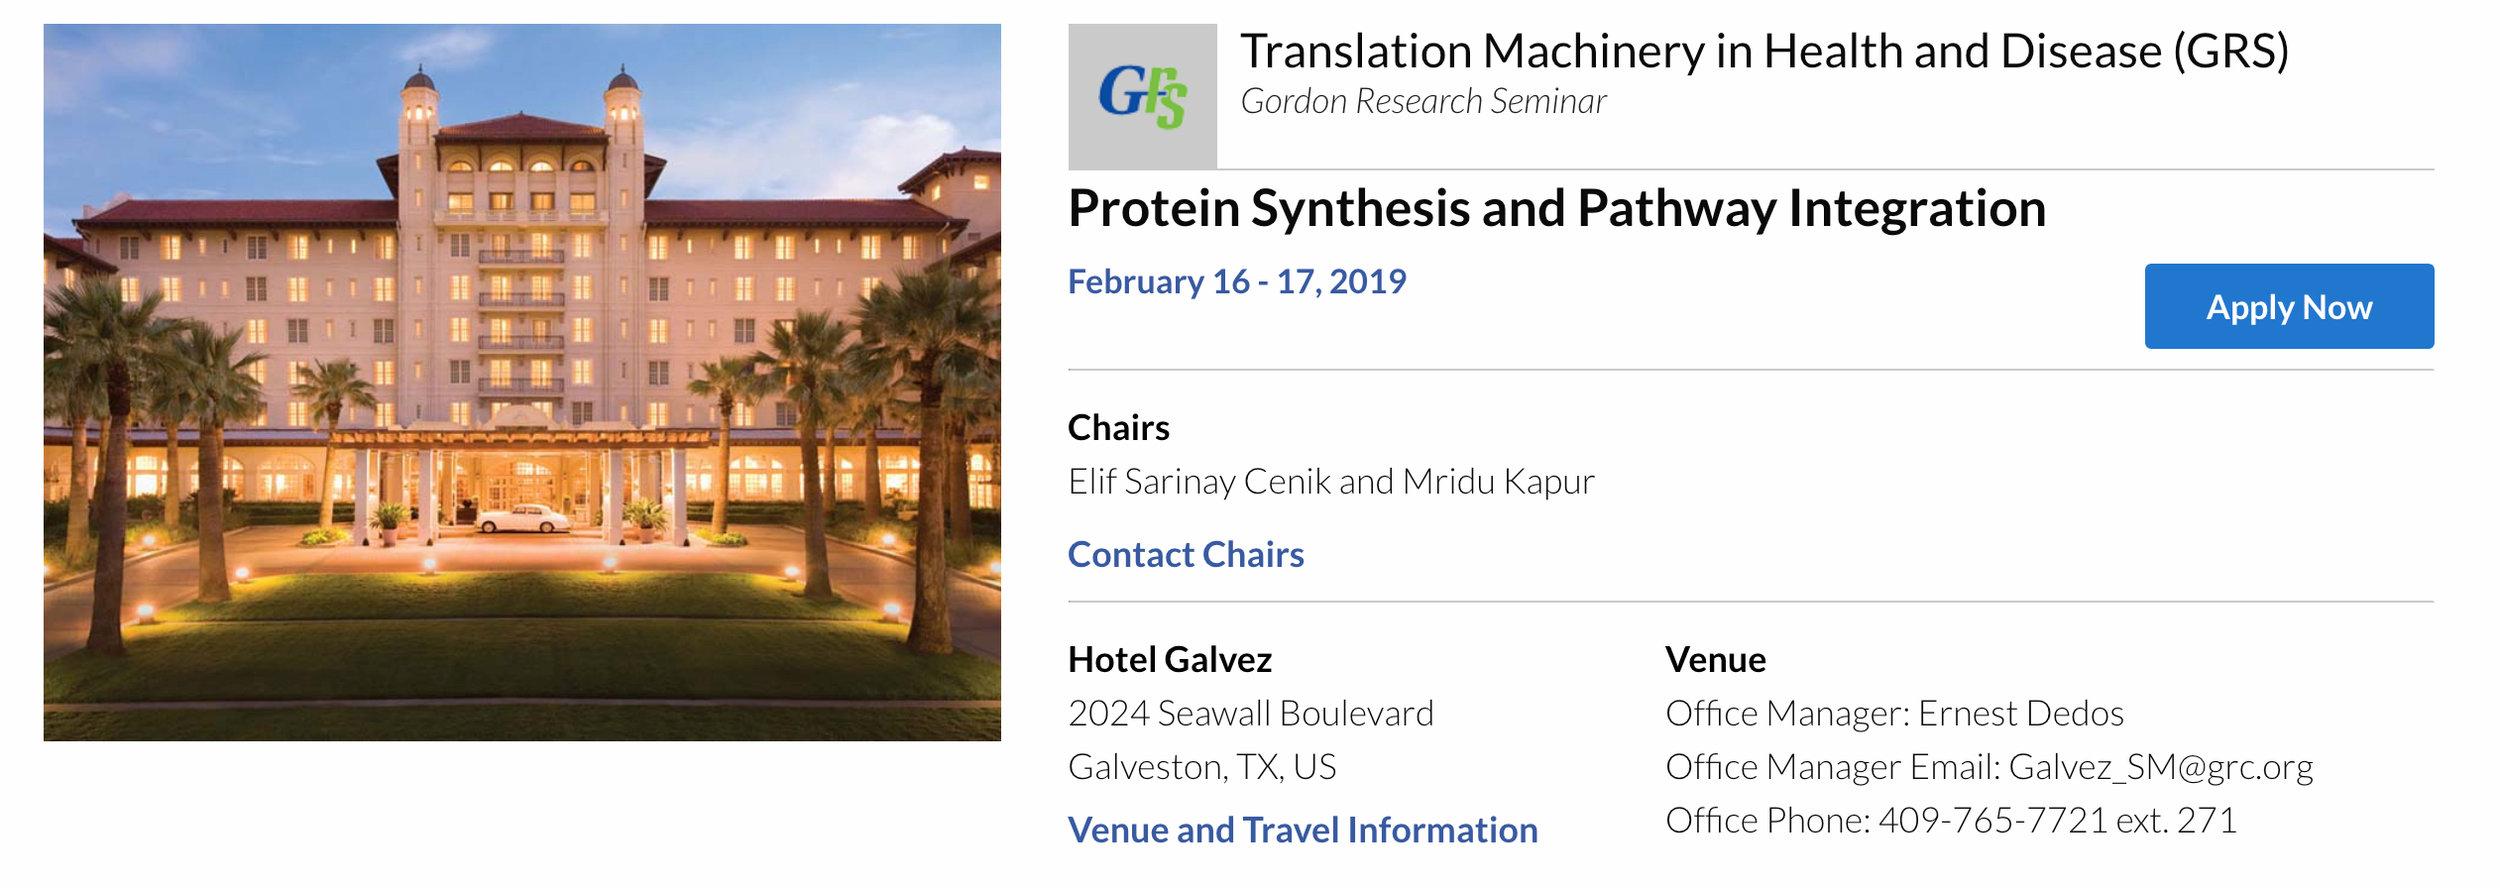 2019_Translation_Machinery_in_Health_and_Disease__GRS__Seminar_GRC.jpg